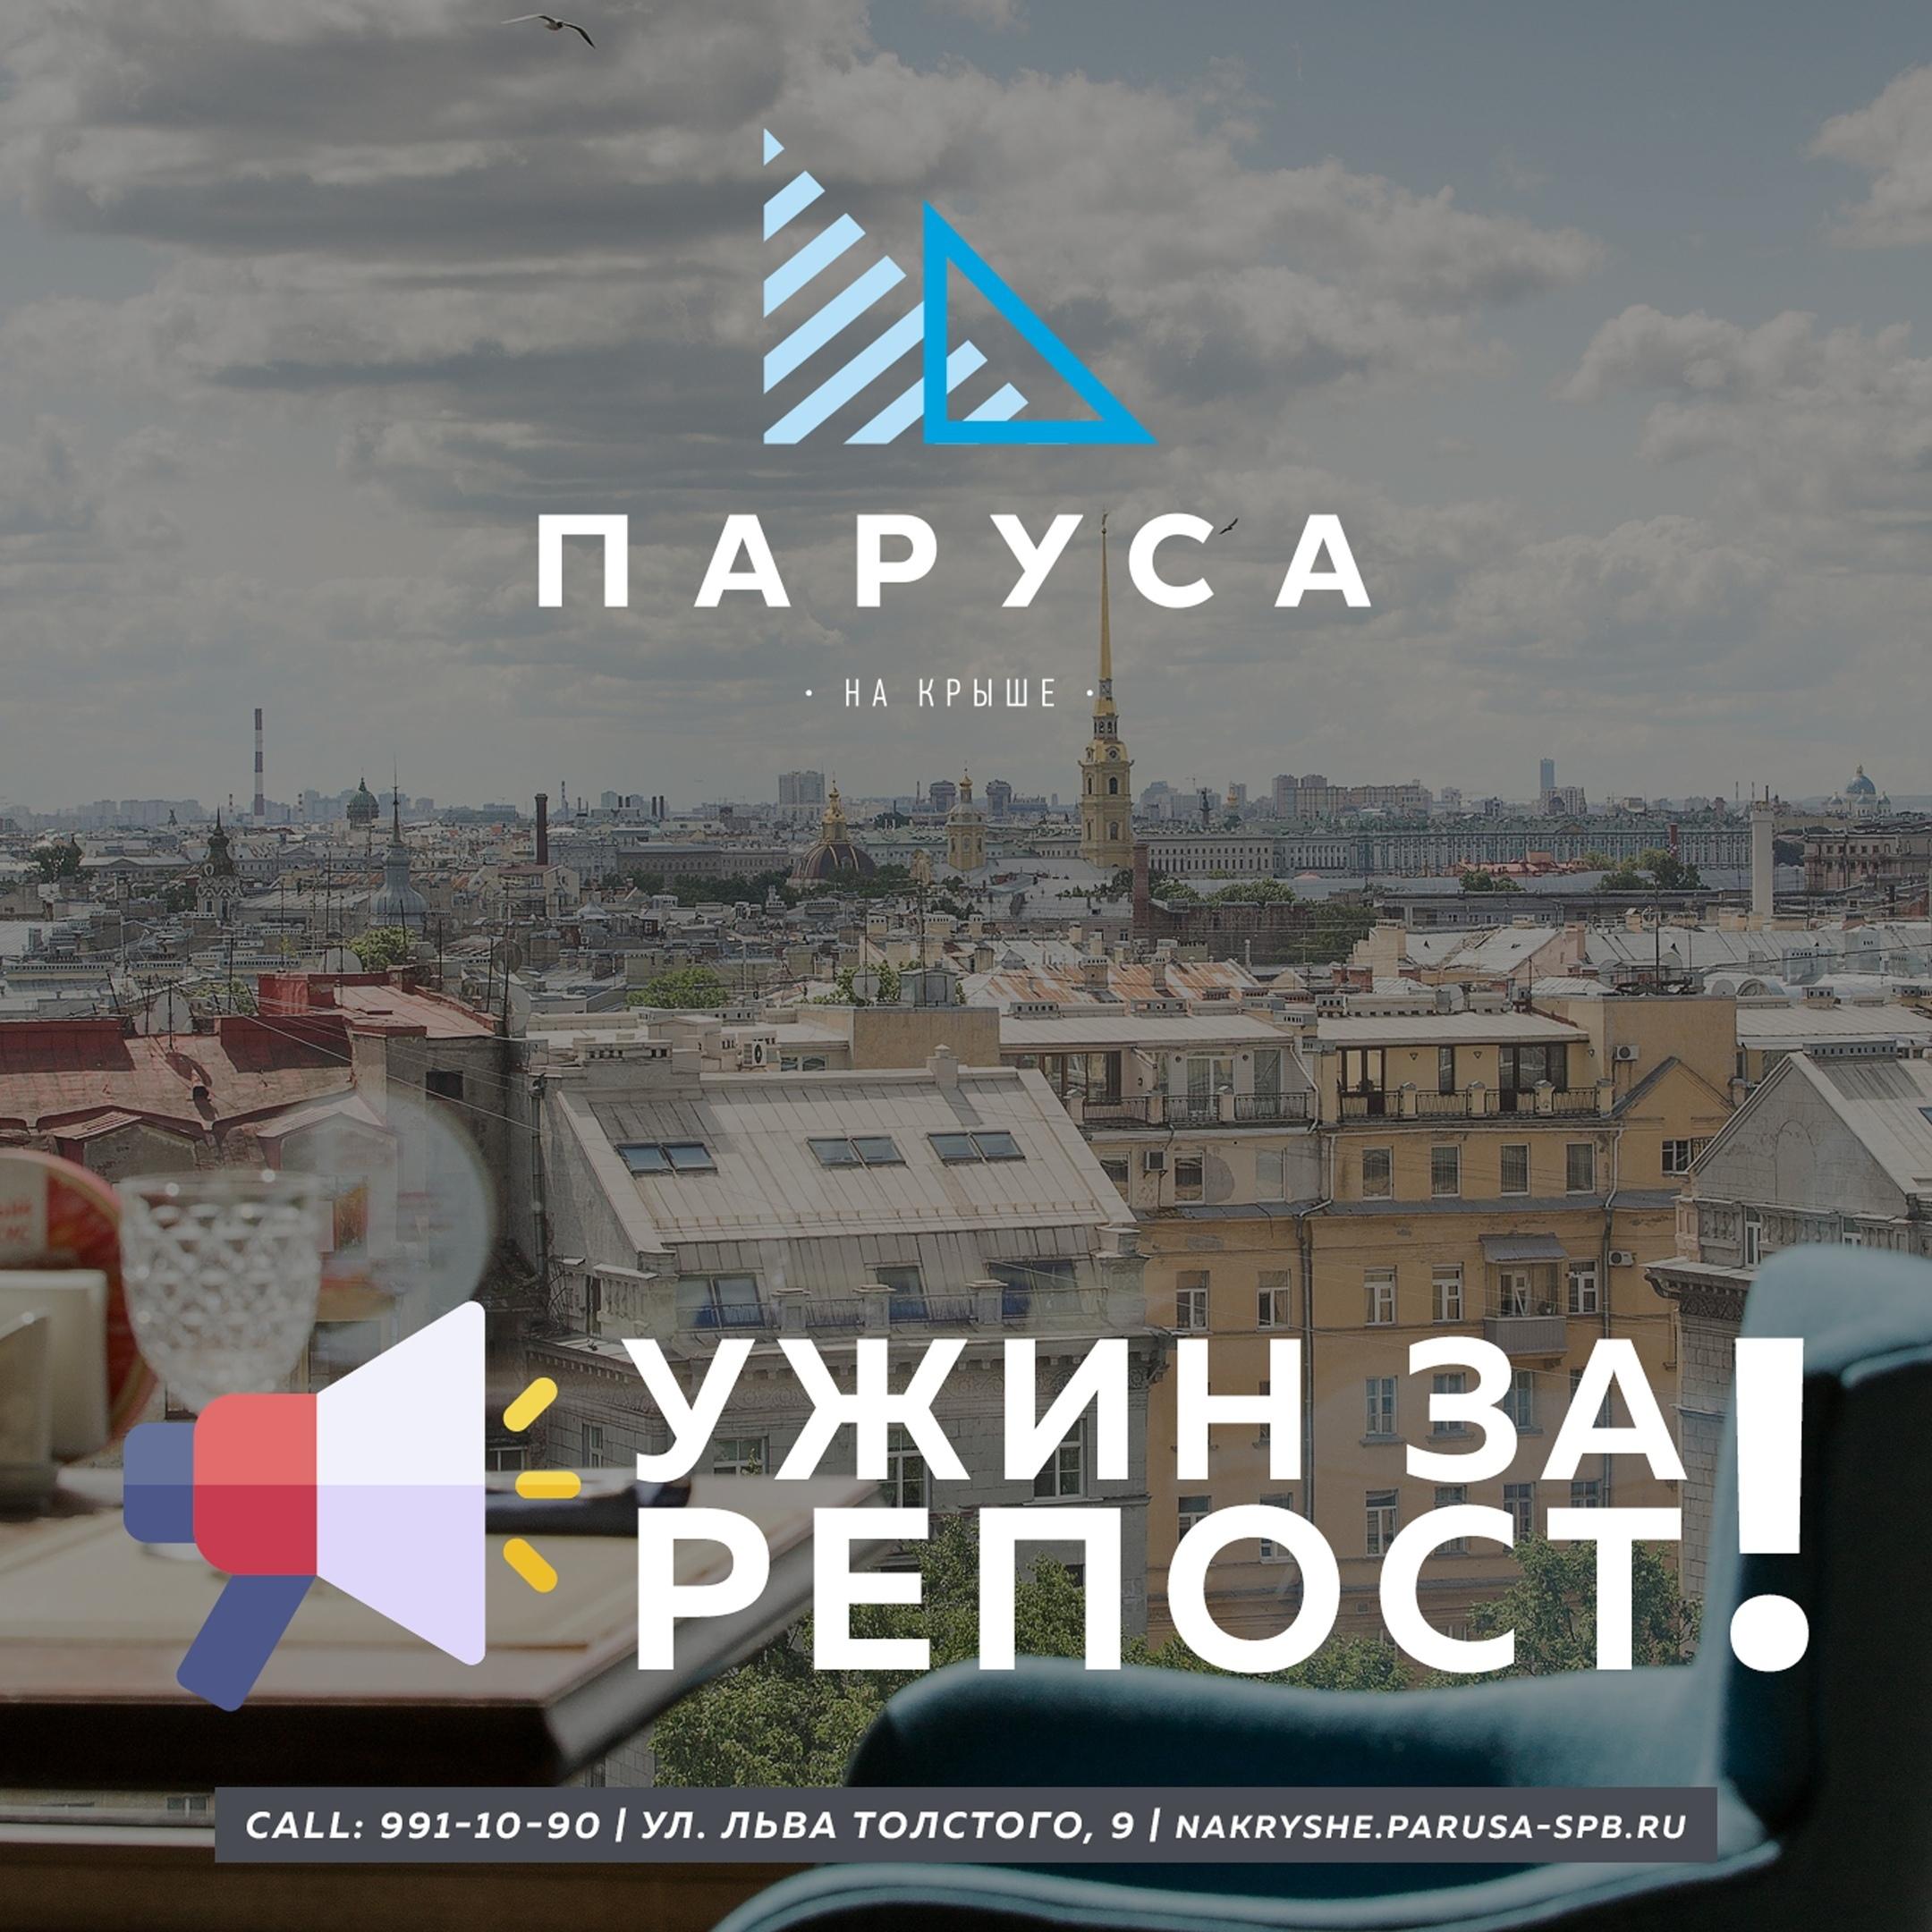 Ресторан «Паруса на крыше» - Вконтакте